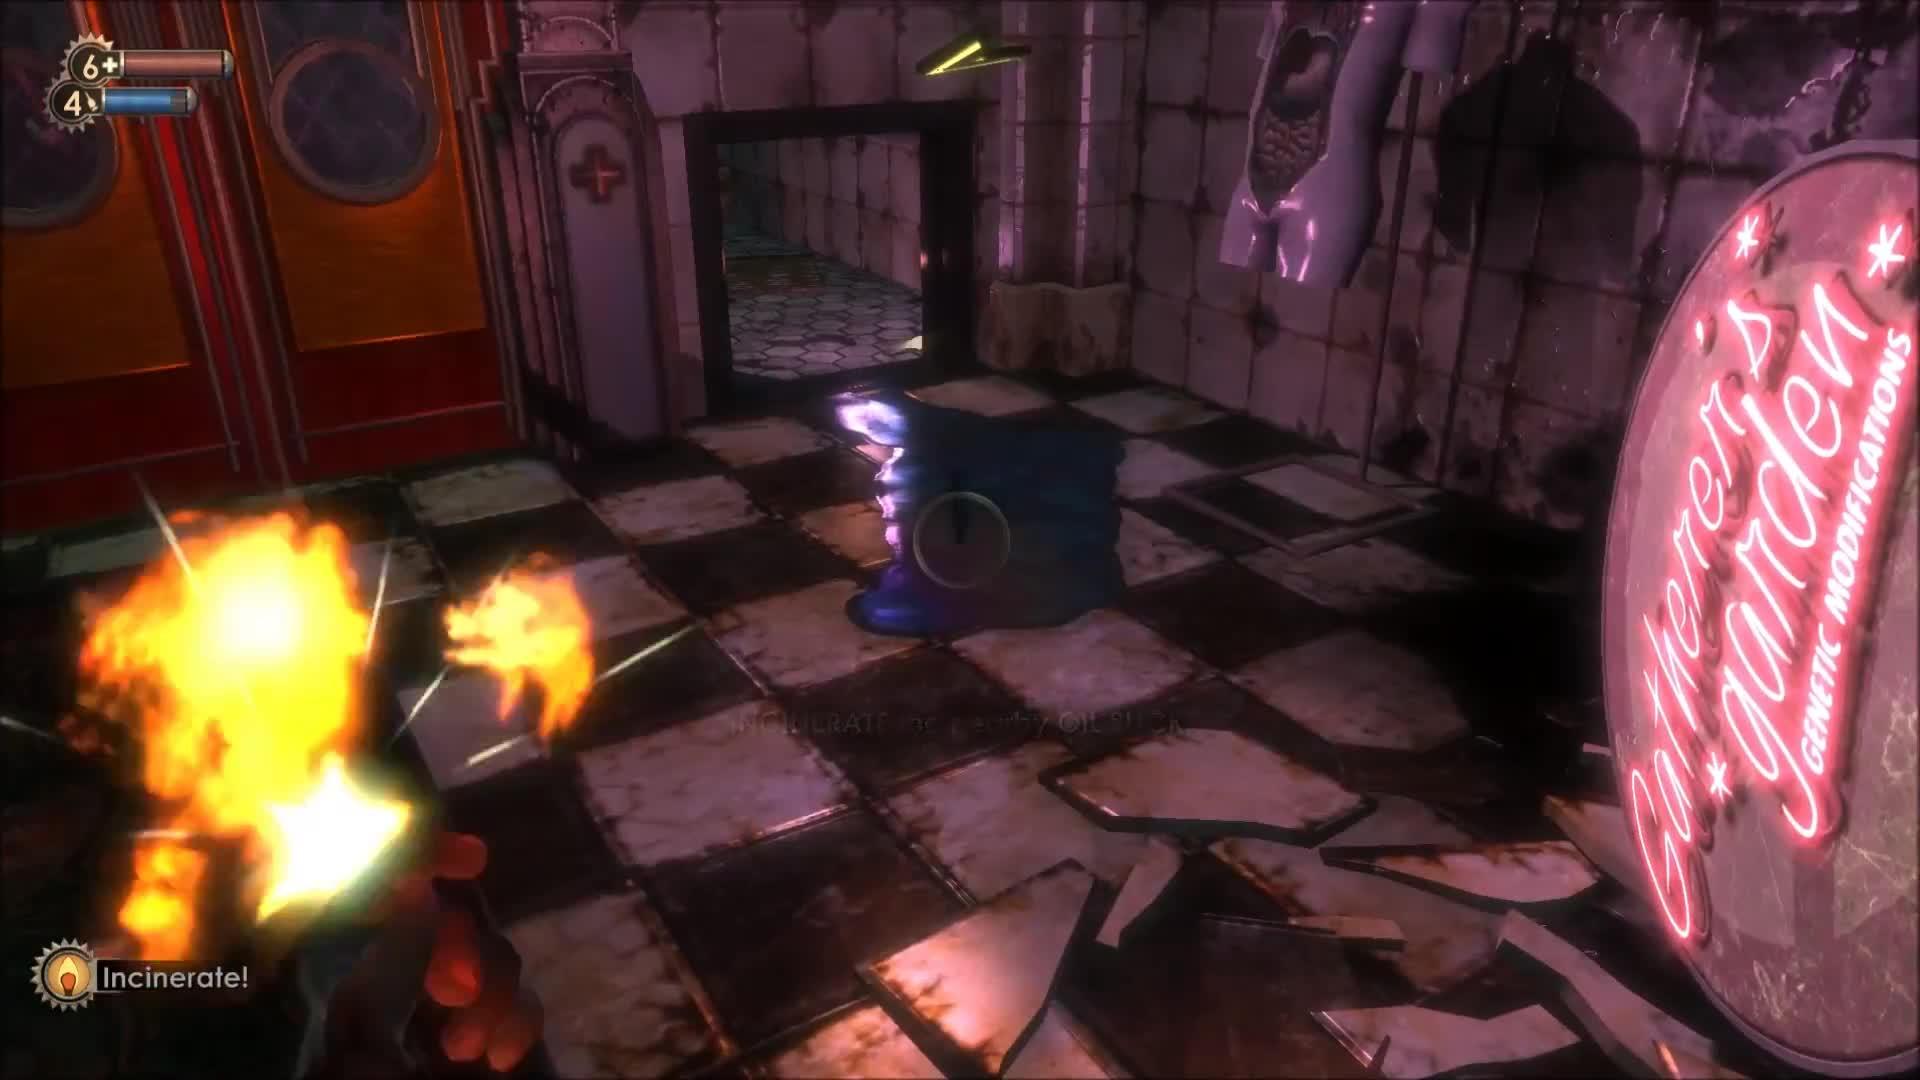 Adam, BioShock (Video Game), Bioshock, Eve, Finding, Fire, Gun, Health, Incinerate, Plasmid, Bioshock - Finding Incinerate GIFs